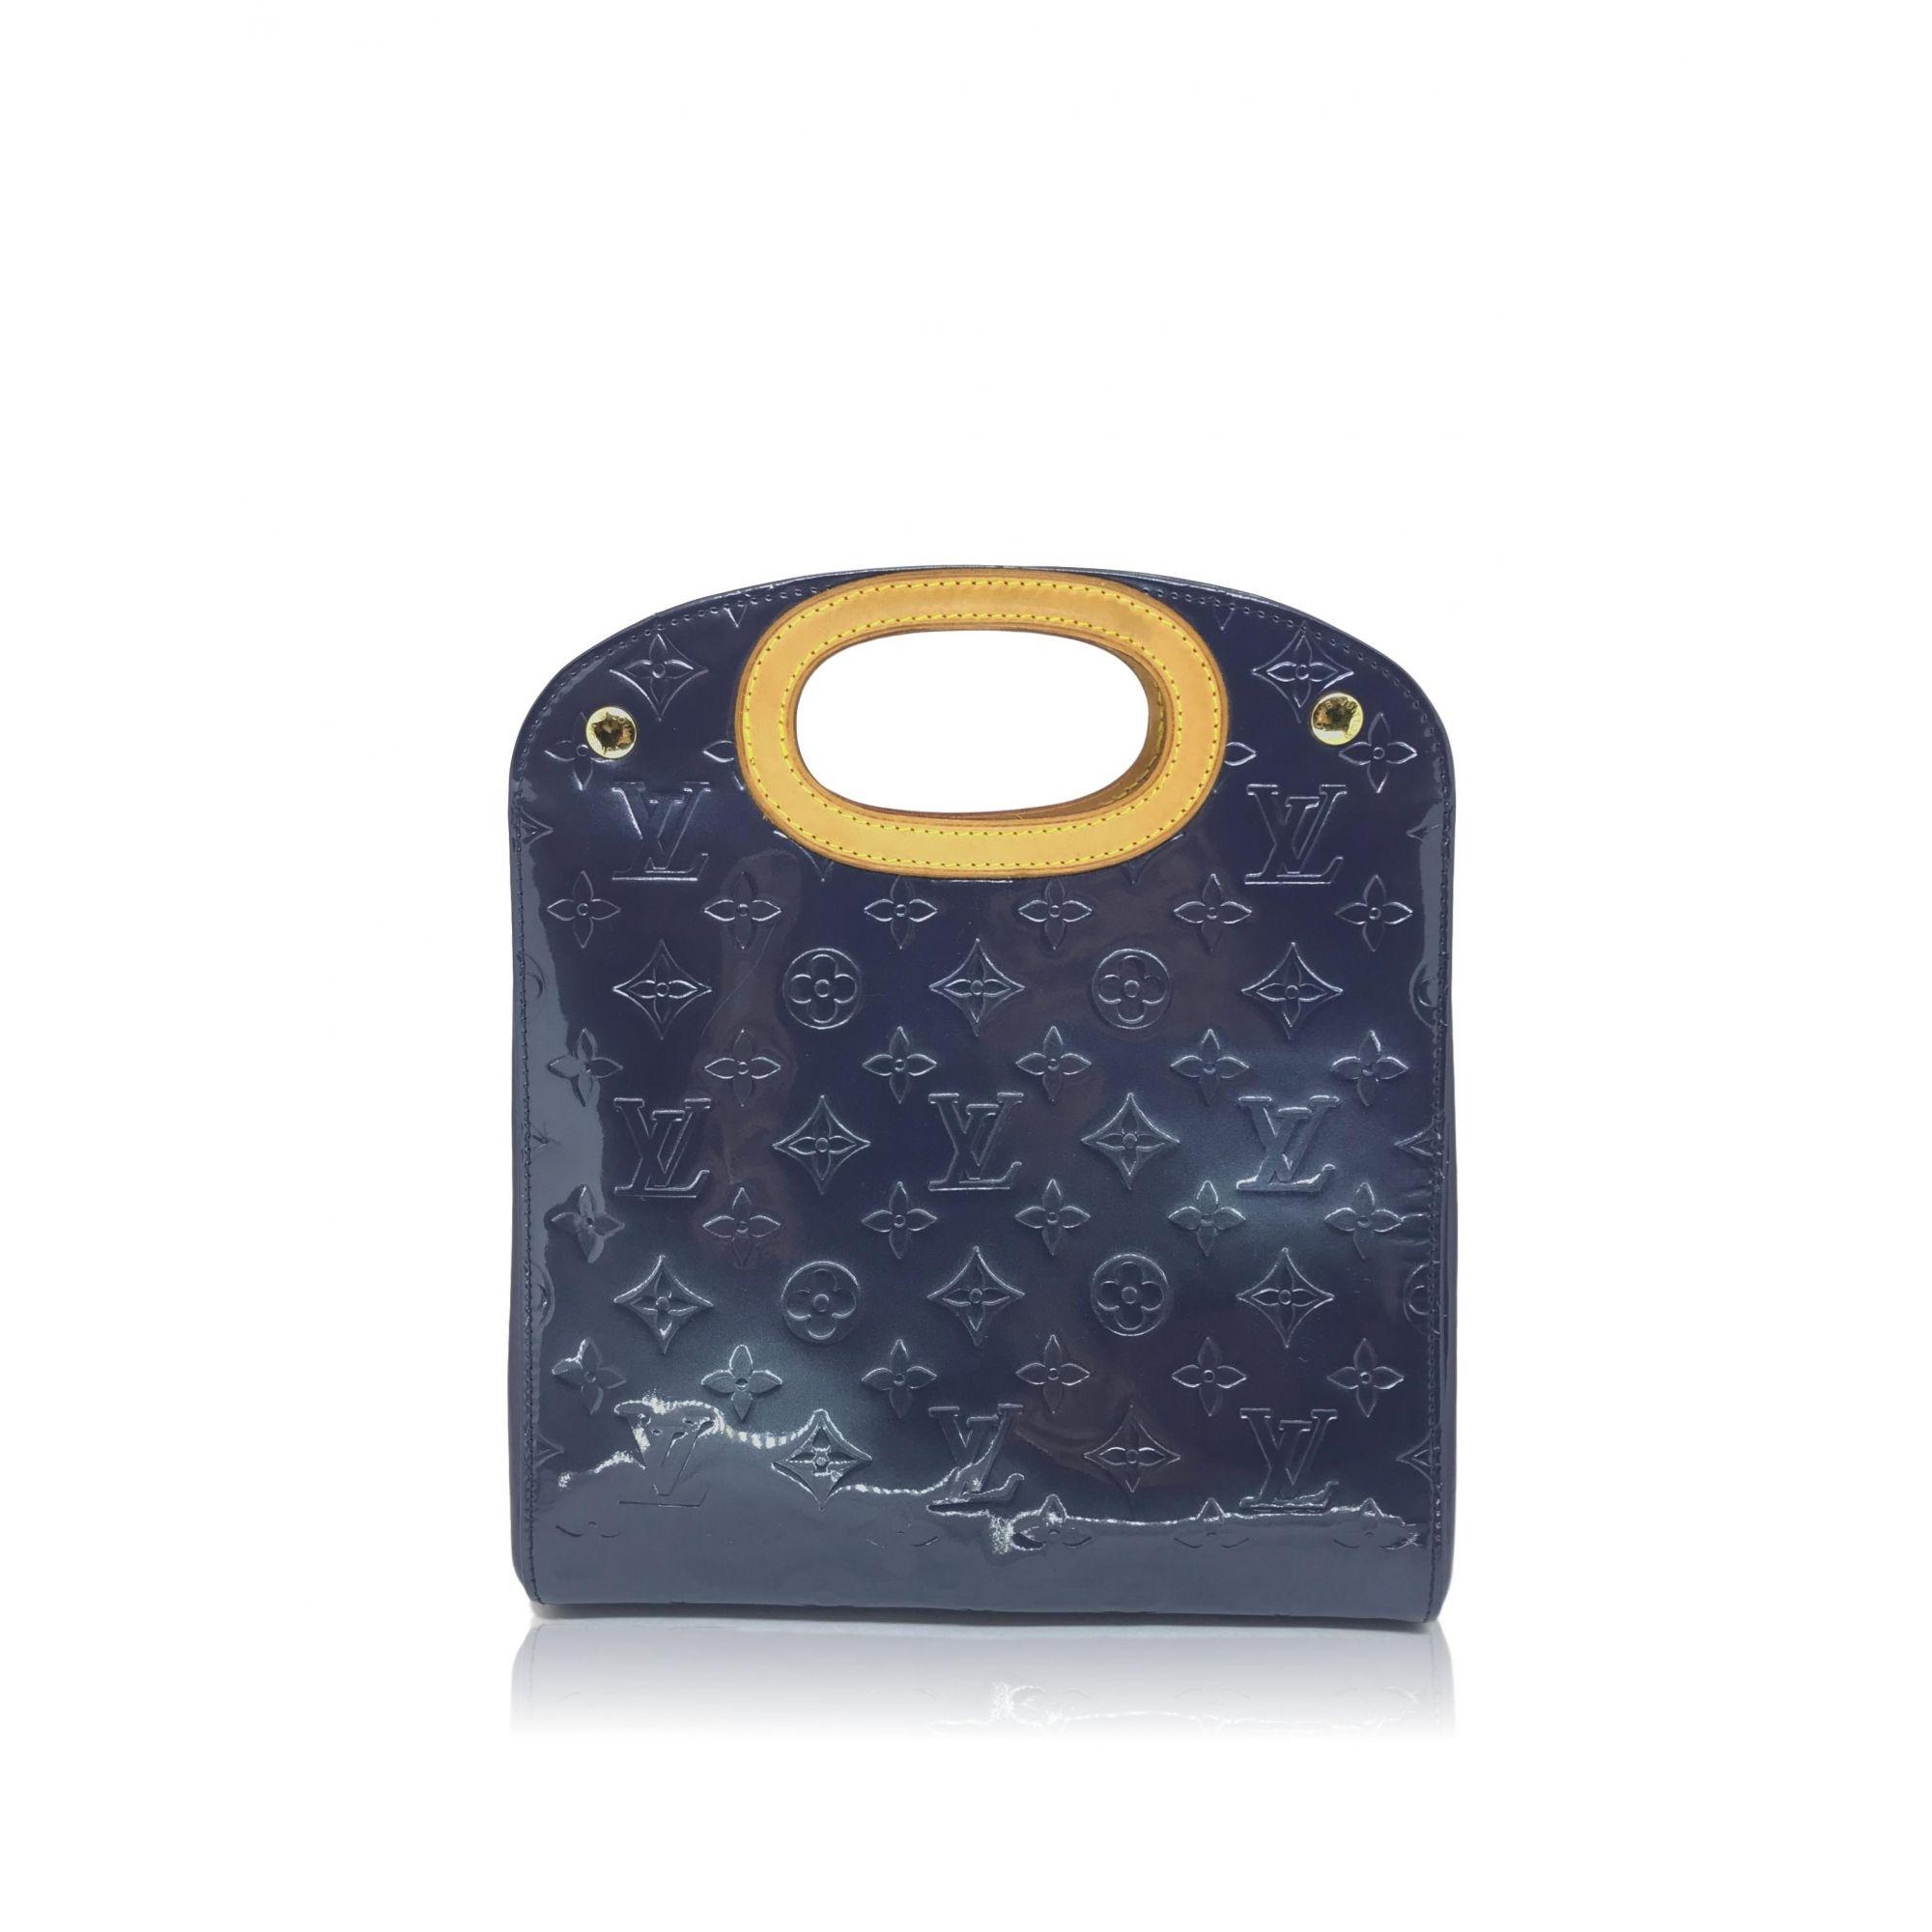 Bolsa Louis Vuitton Verniz